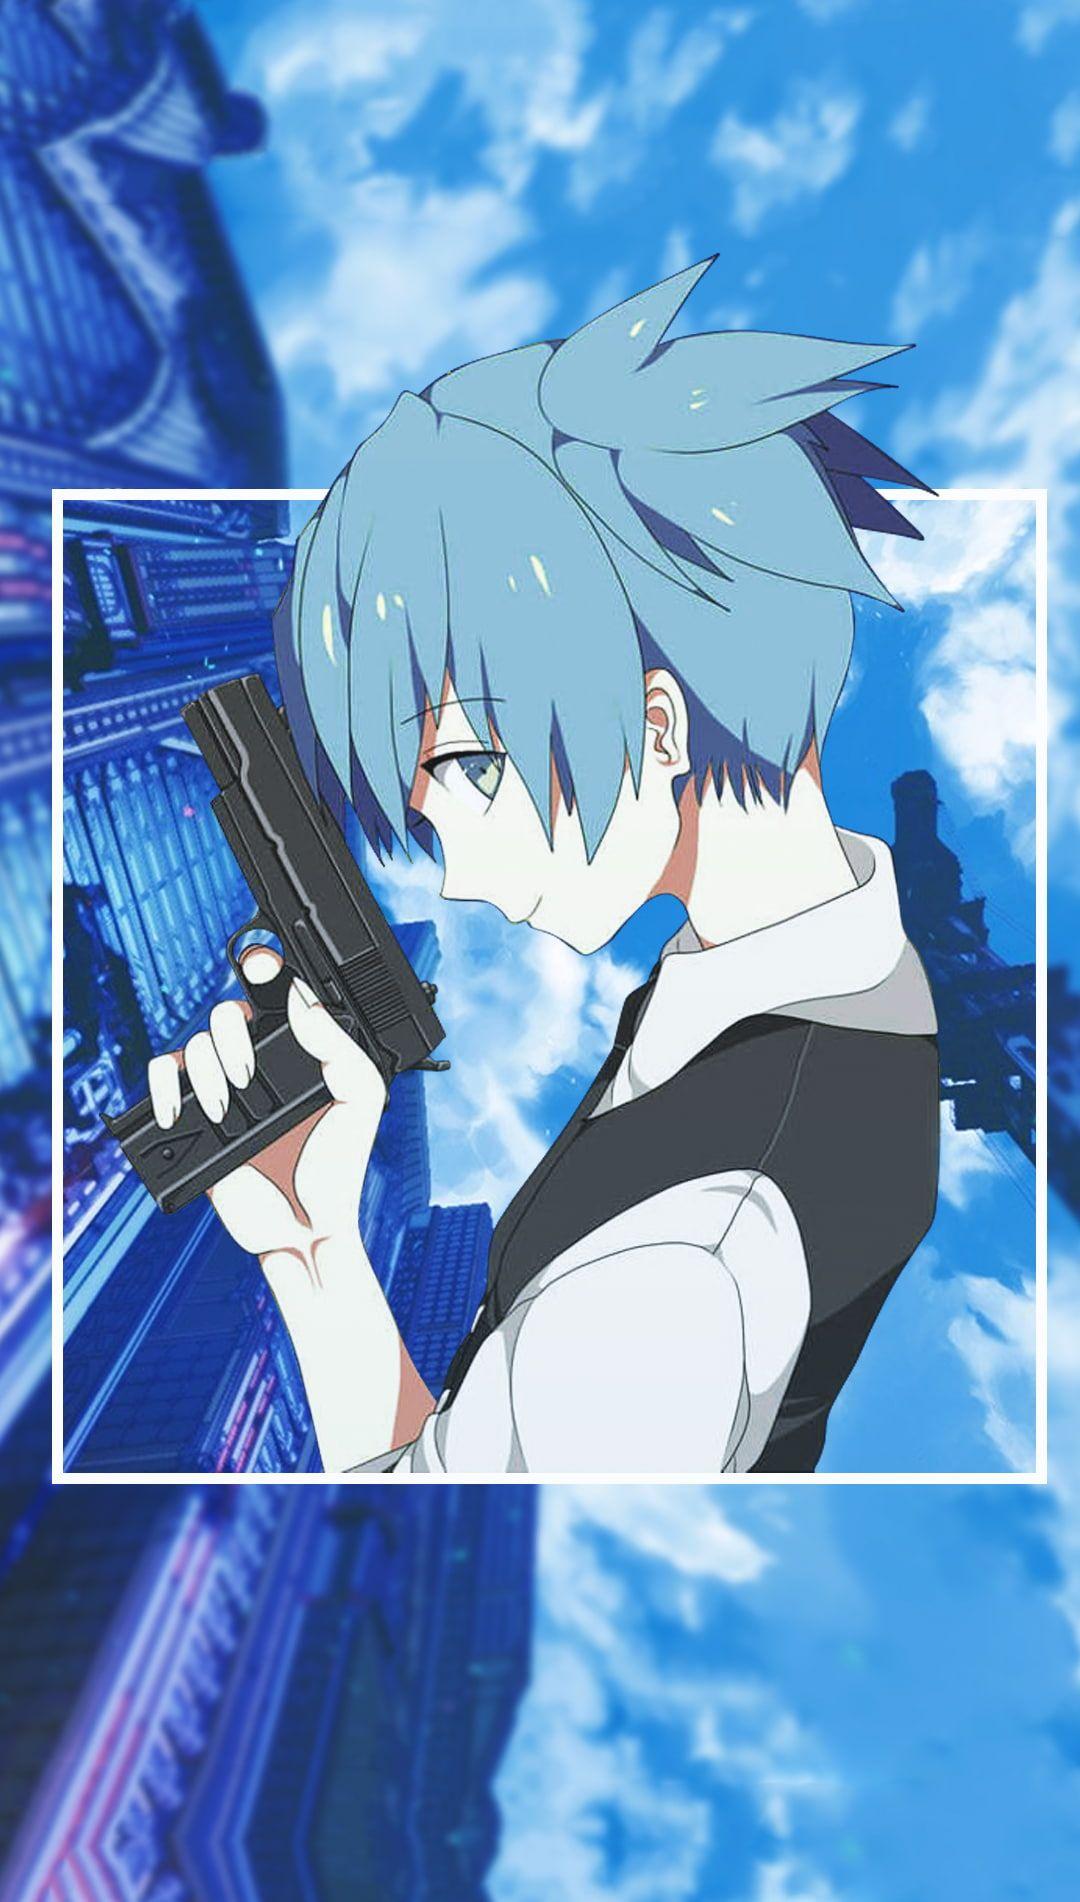 76 Assassination Classroom Wallpaper Hd Assasination Classroom Anime Assassination Classroom